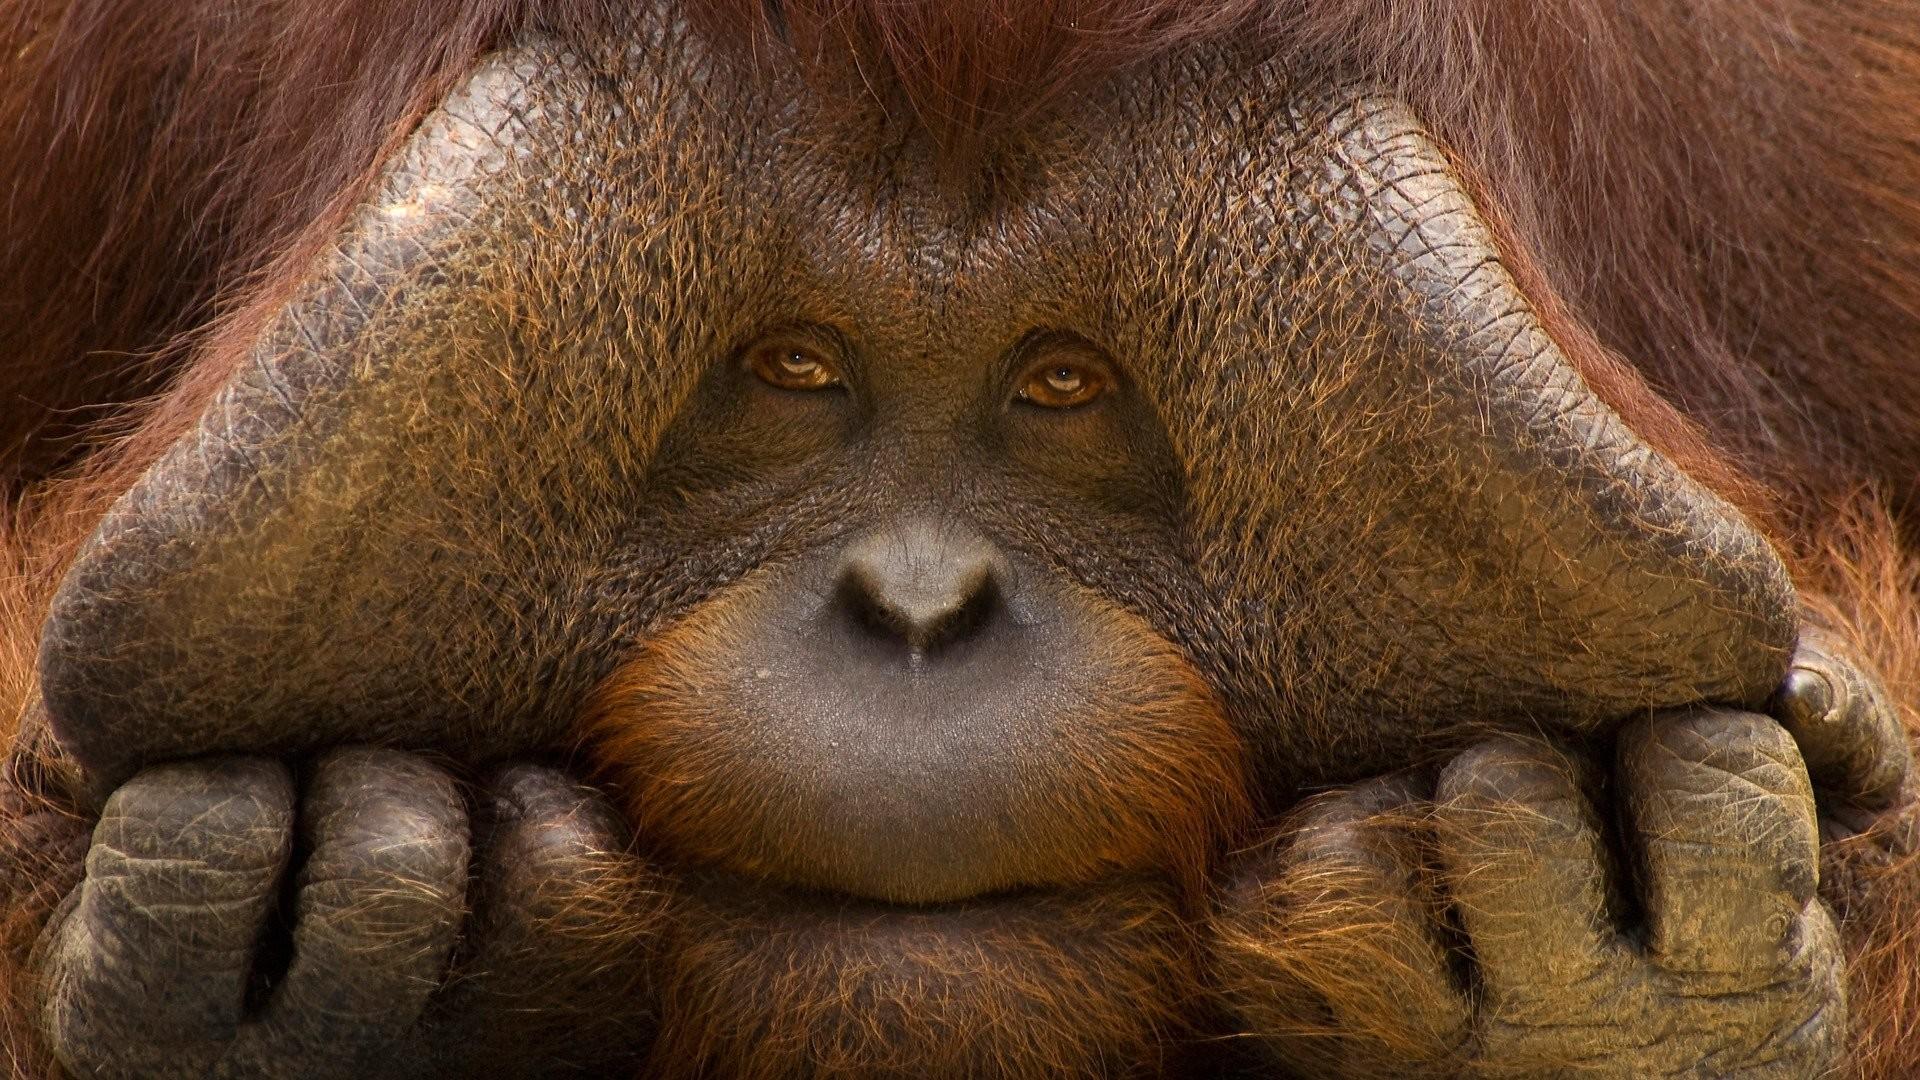 Orangutan Wallpaper ①